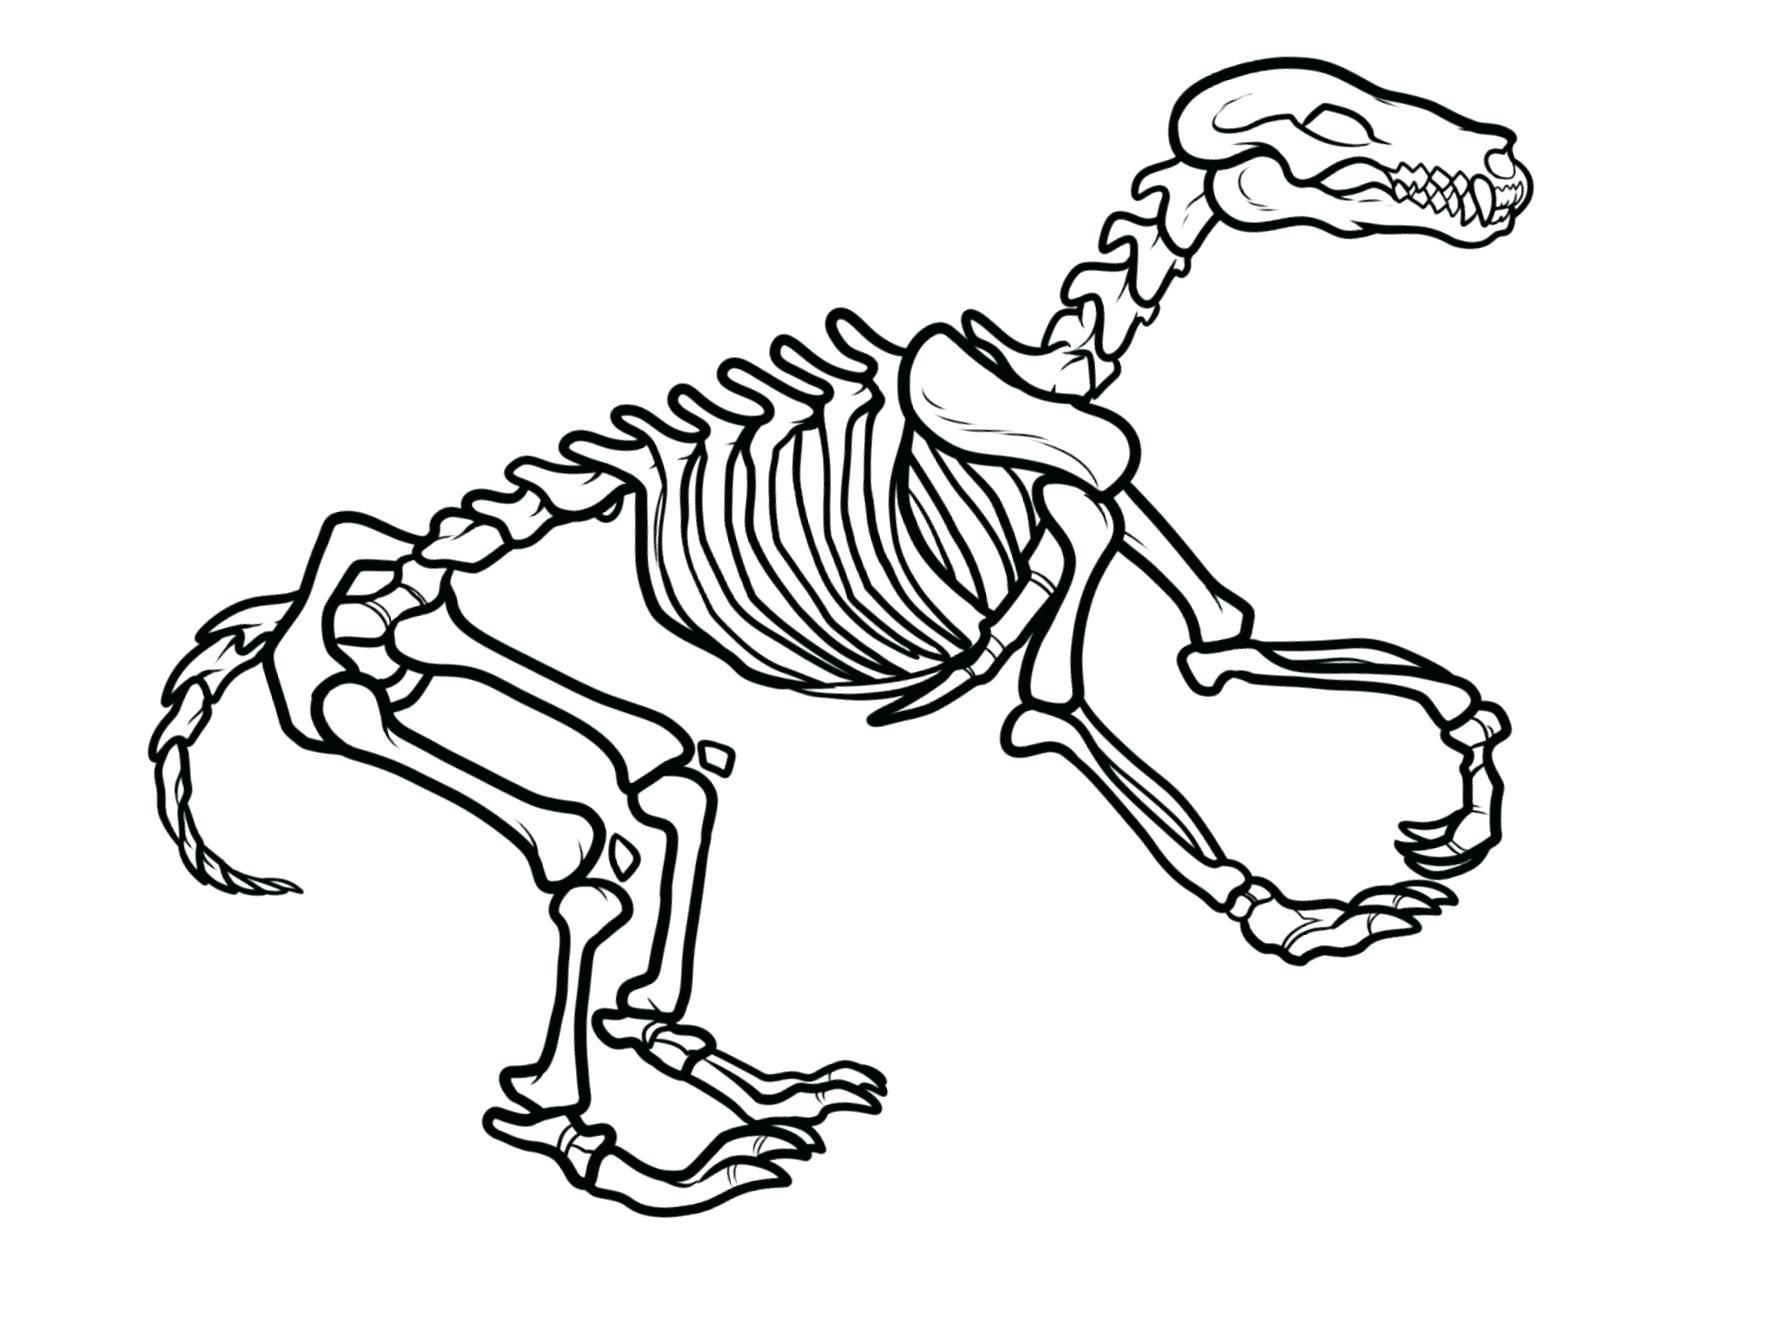 1792x1323 Edge Dinosaur Skeleton Coloring Page T Rex Pag